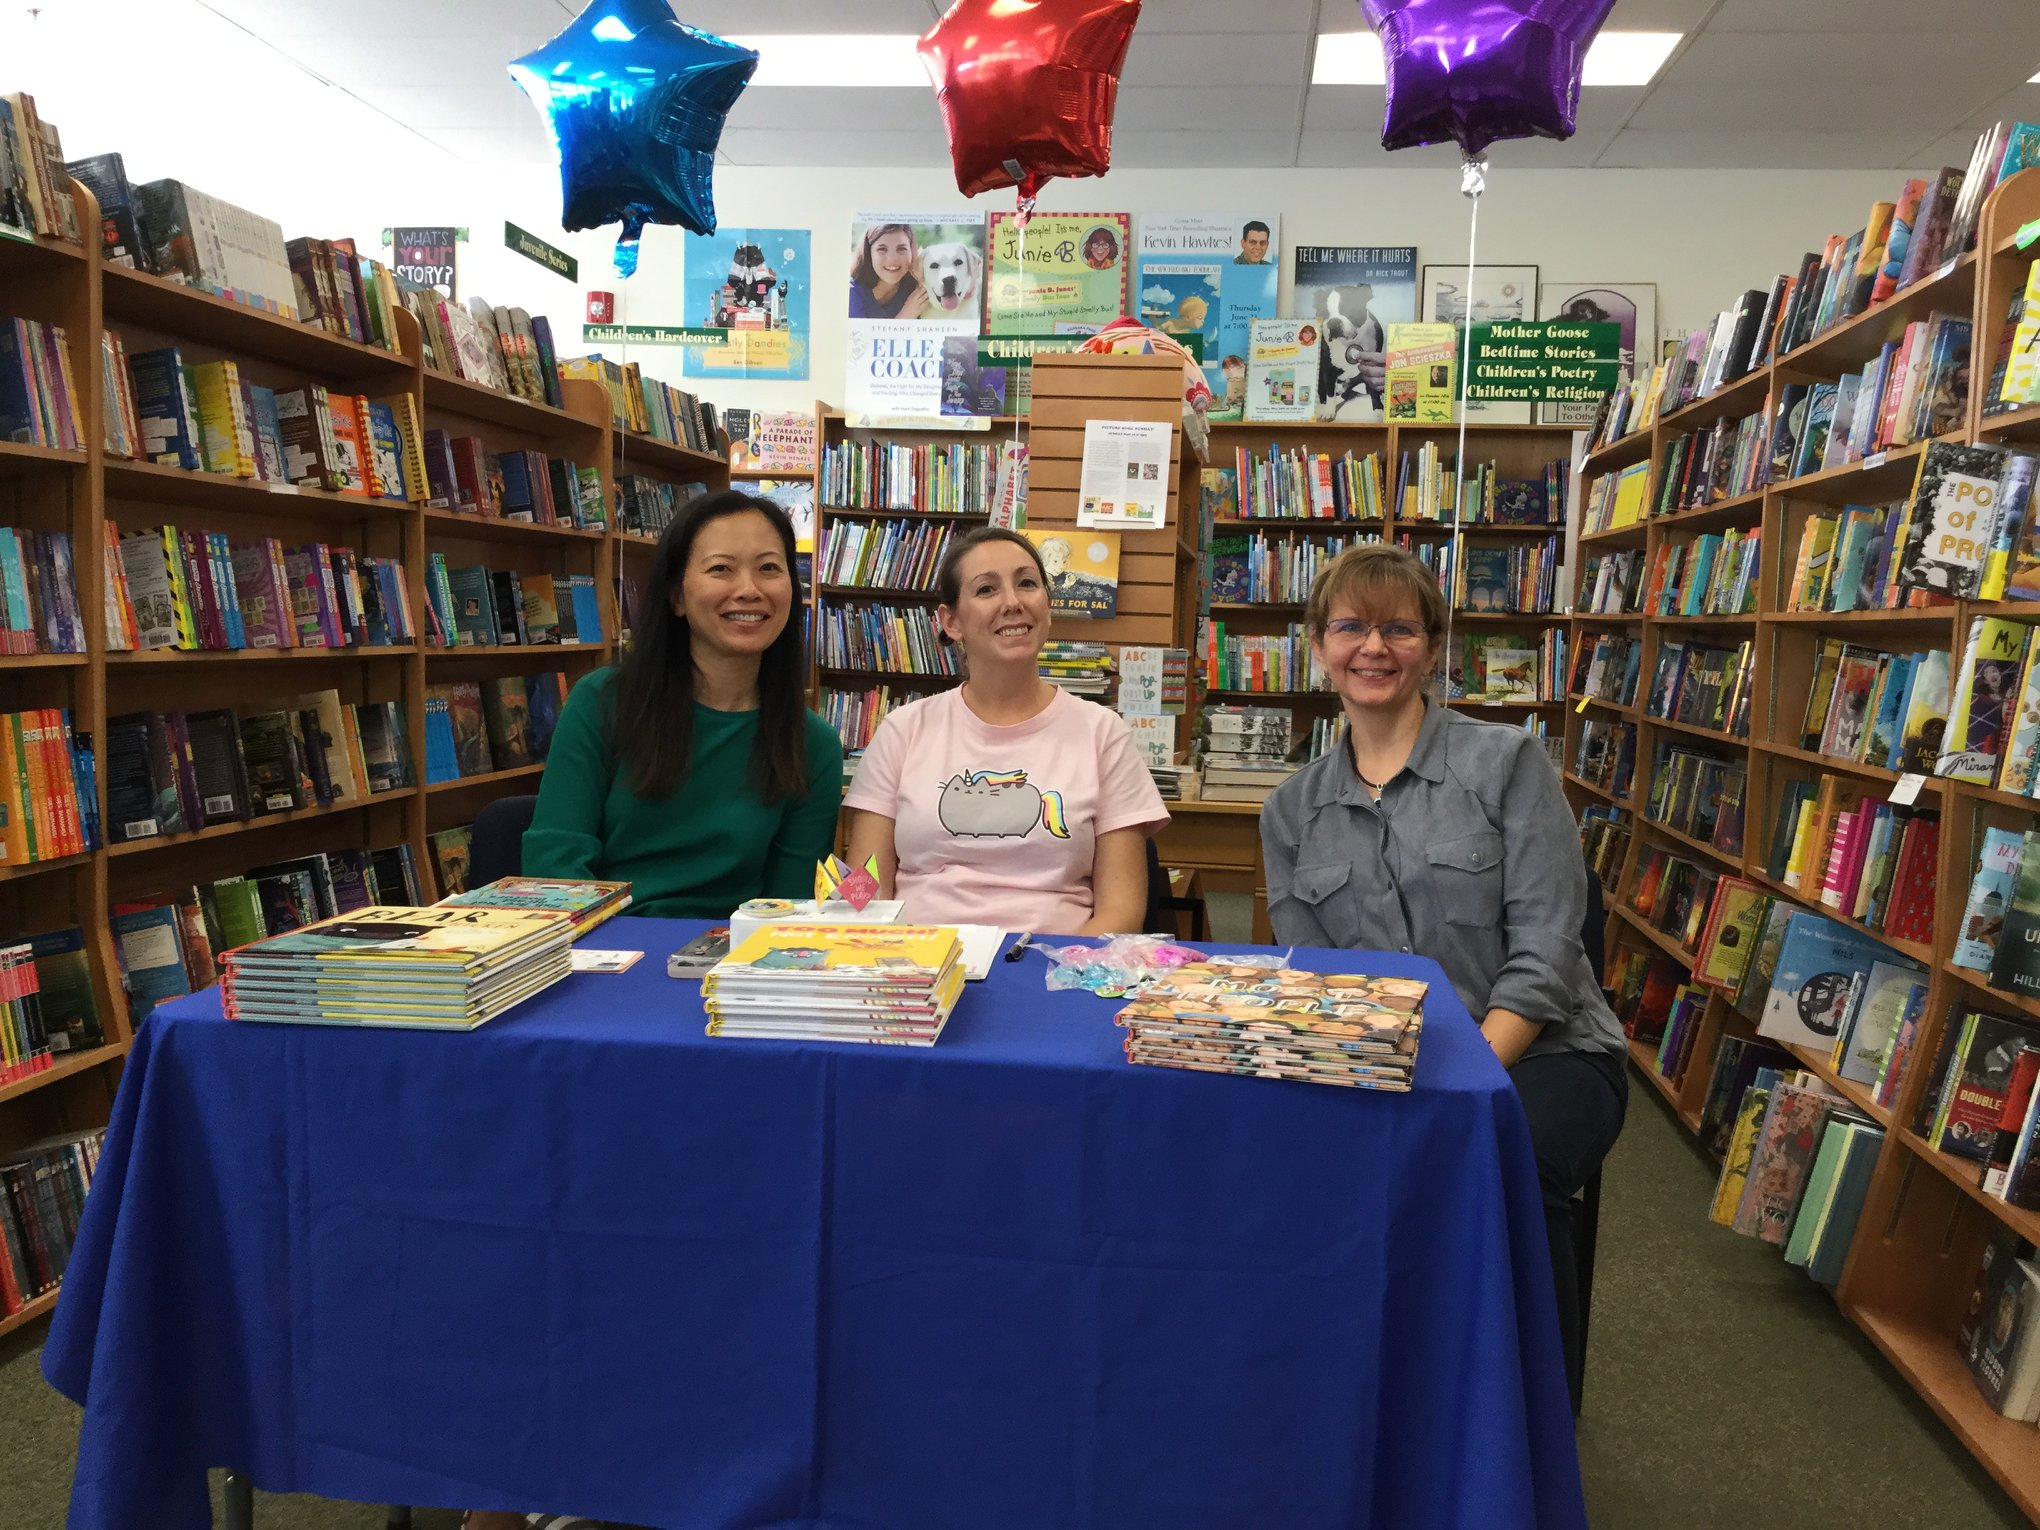 Toadstool Bookshop Milford, NH